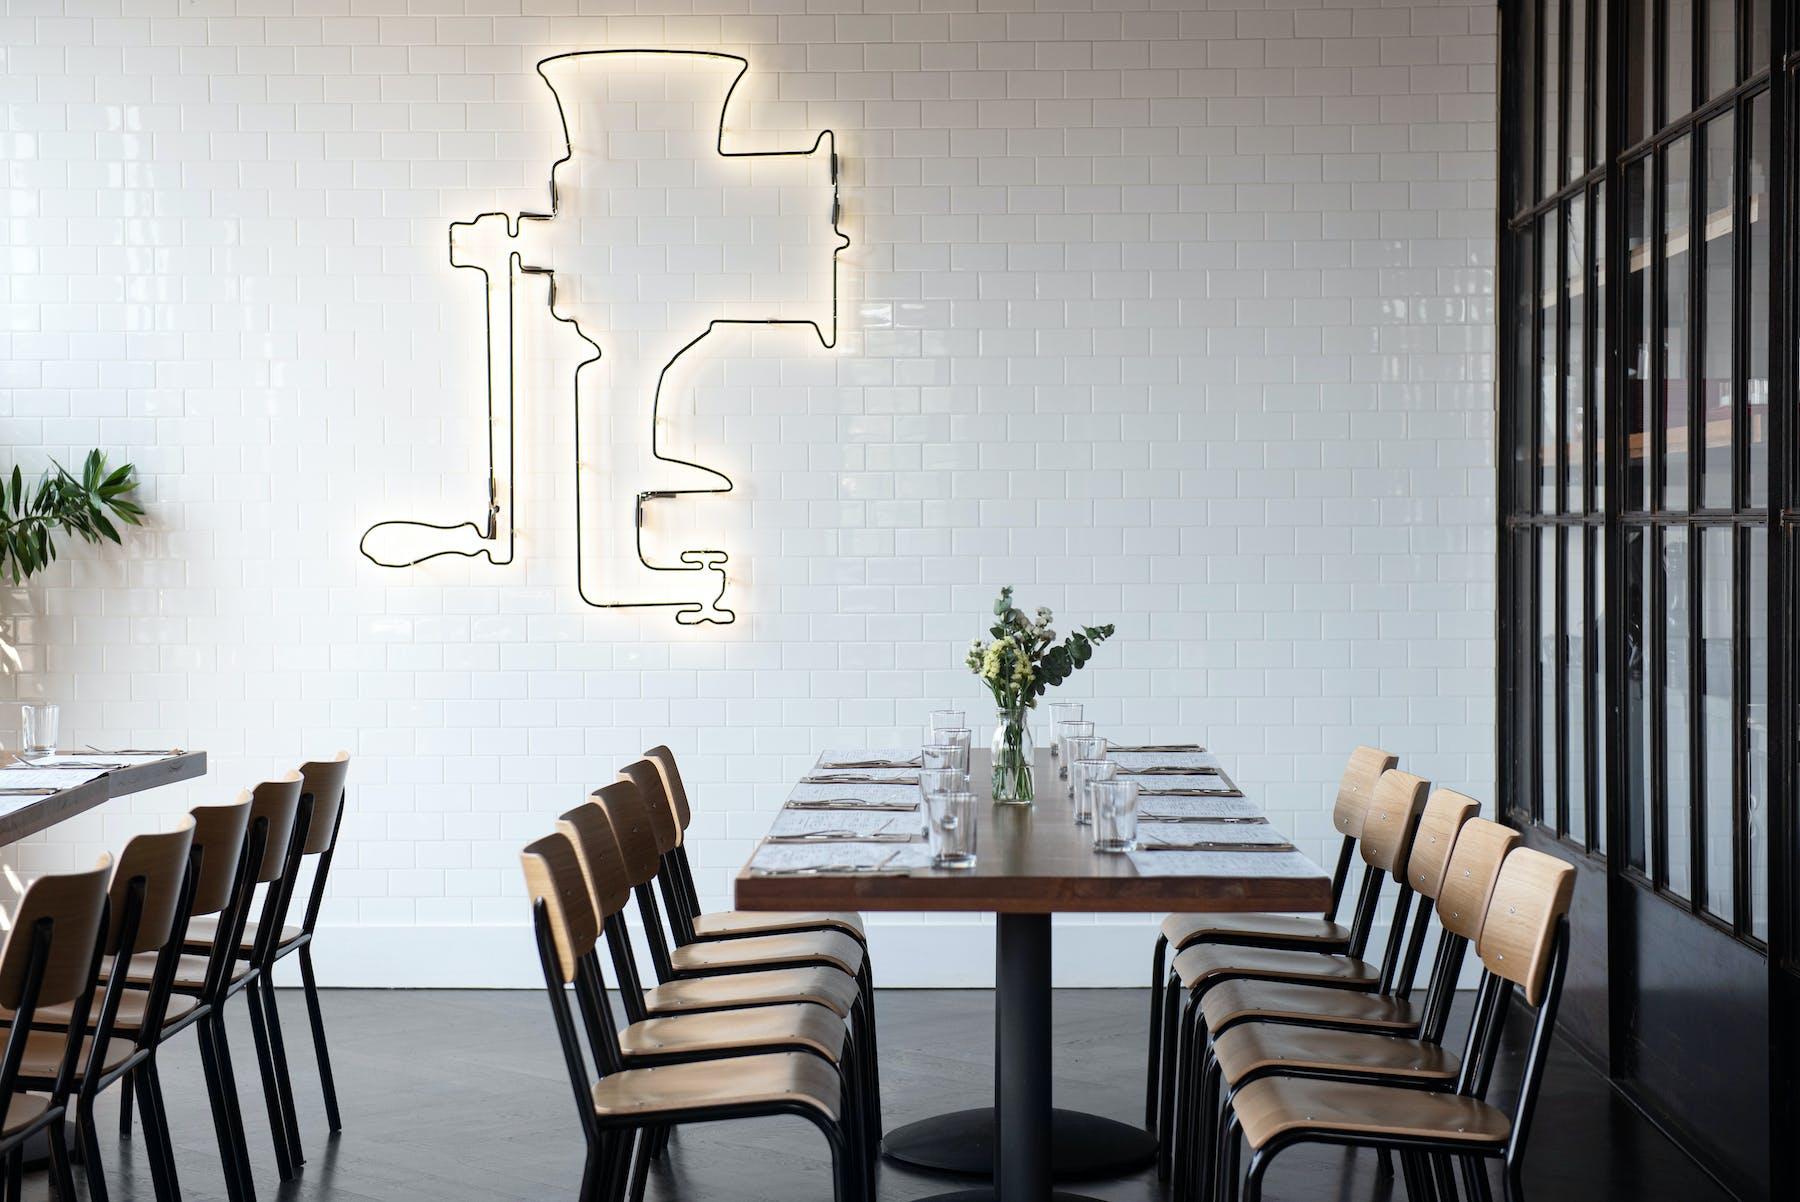 Westport, Ct - Private Dining Room number 4